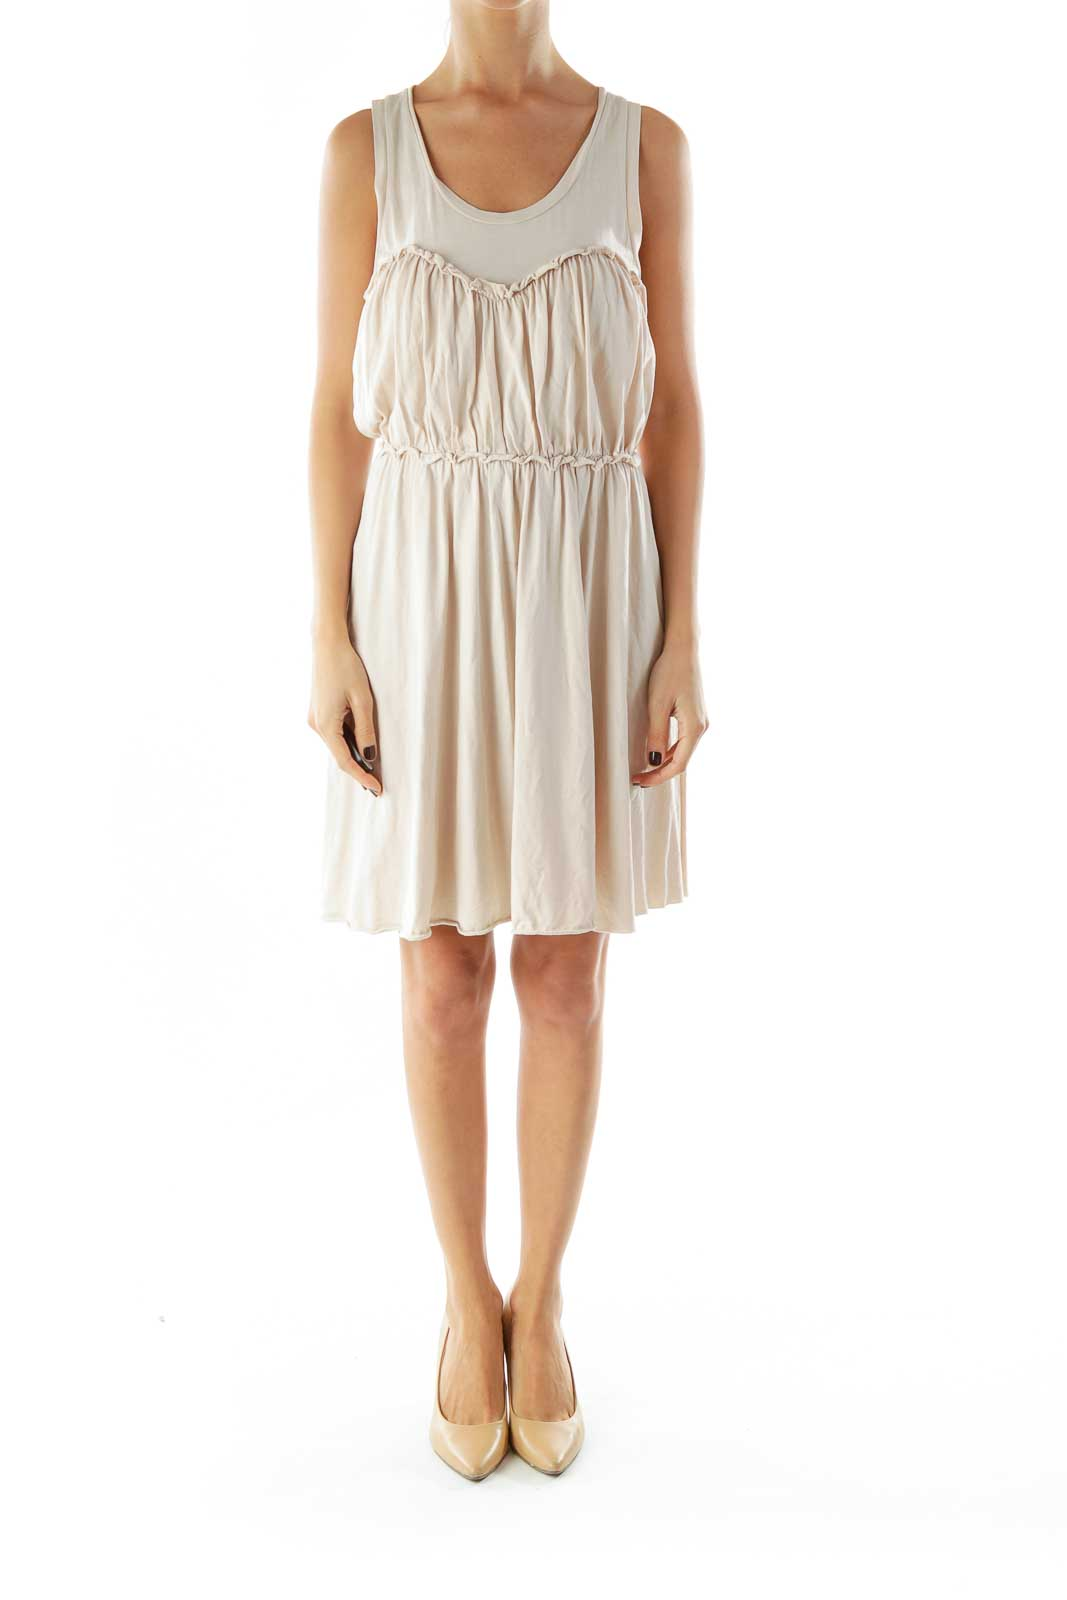 Beige Scrunch Detail Day Dress